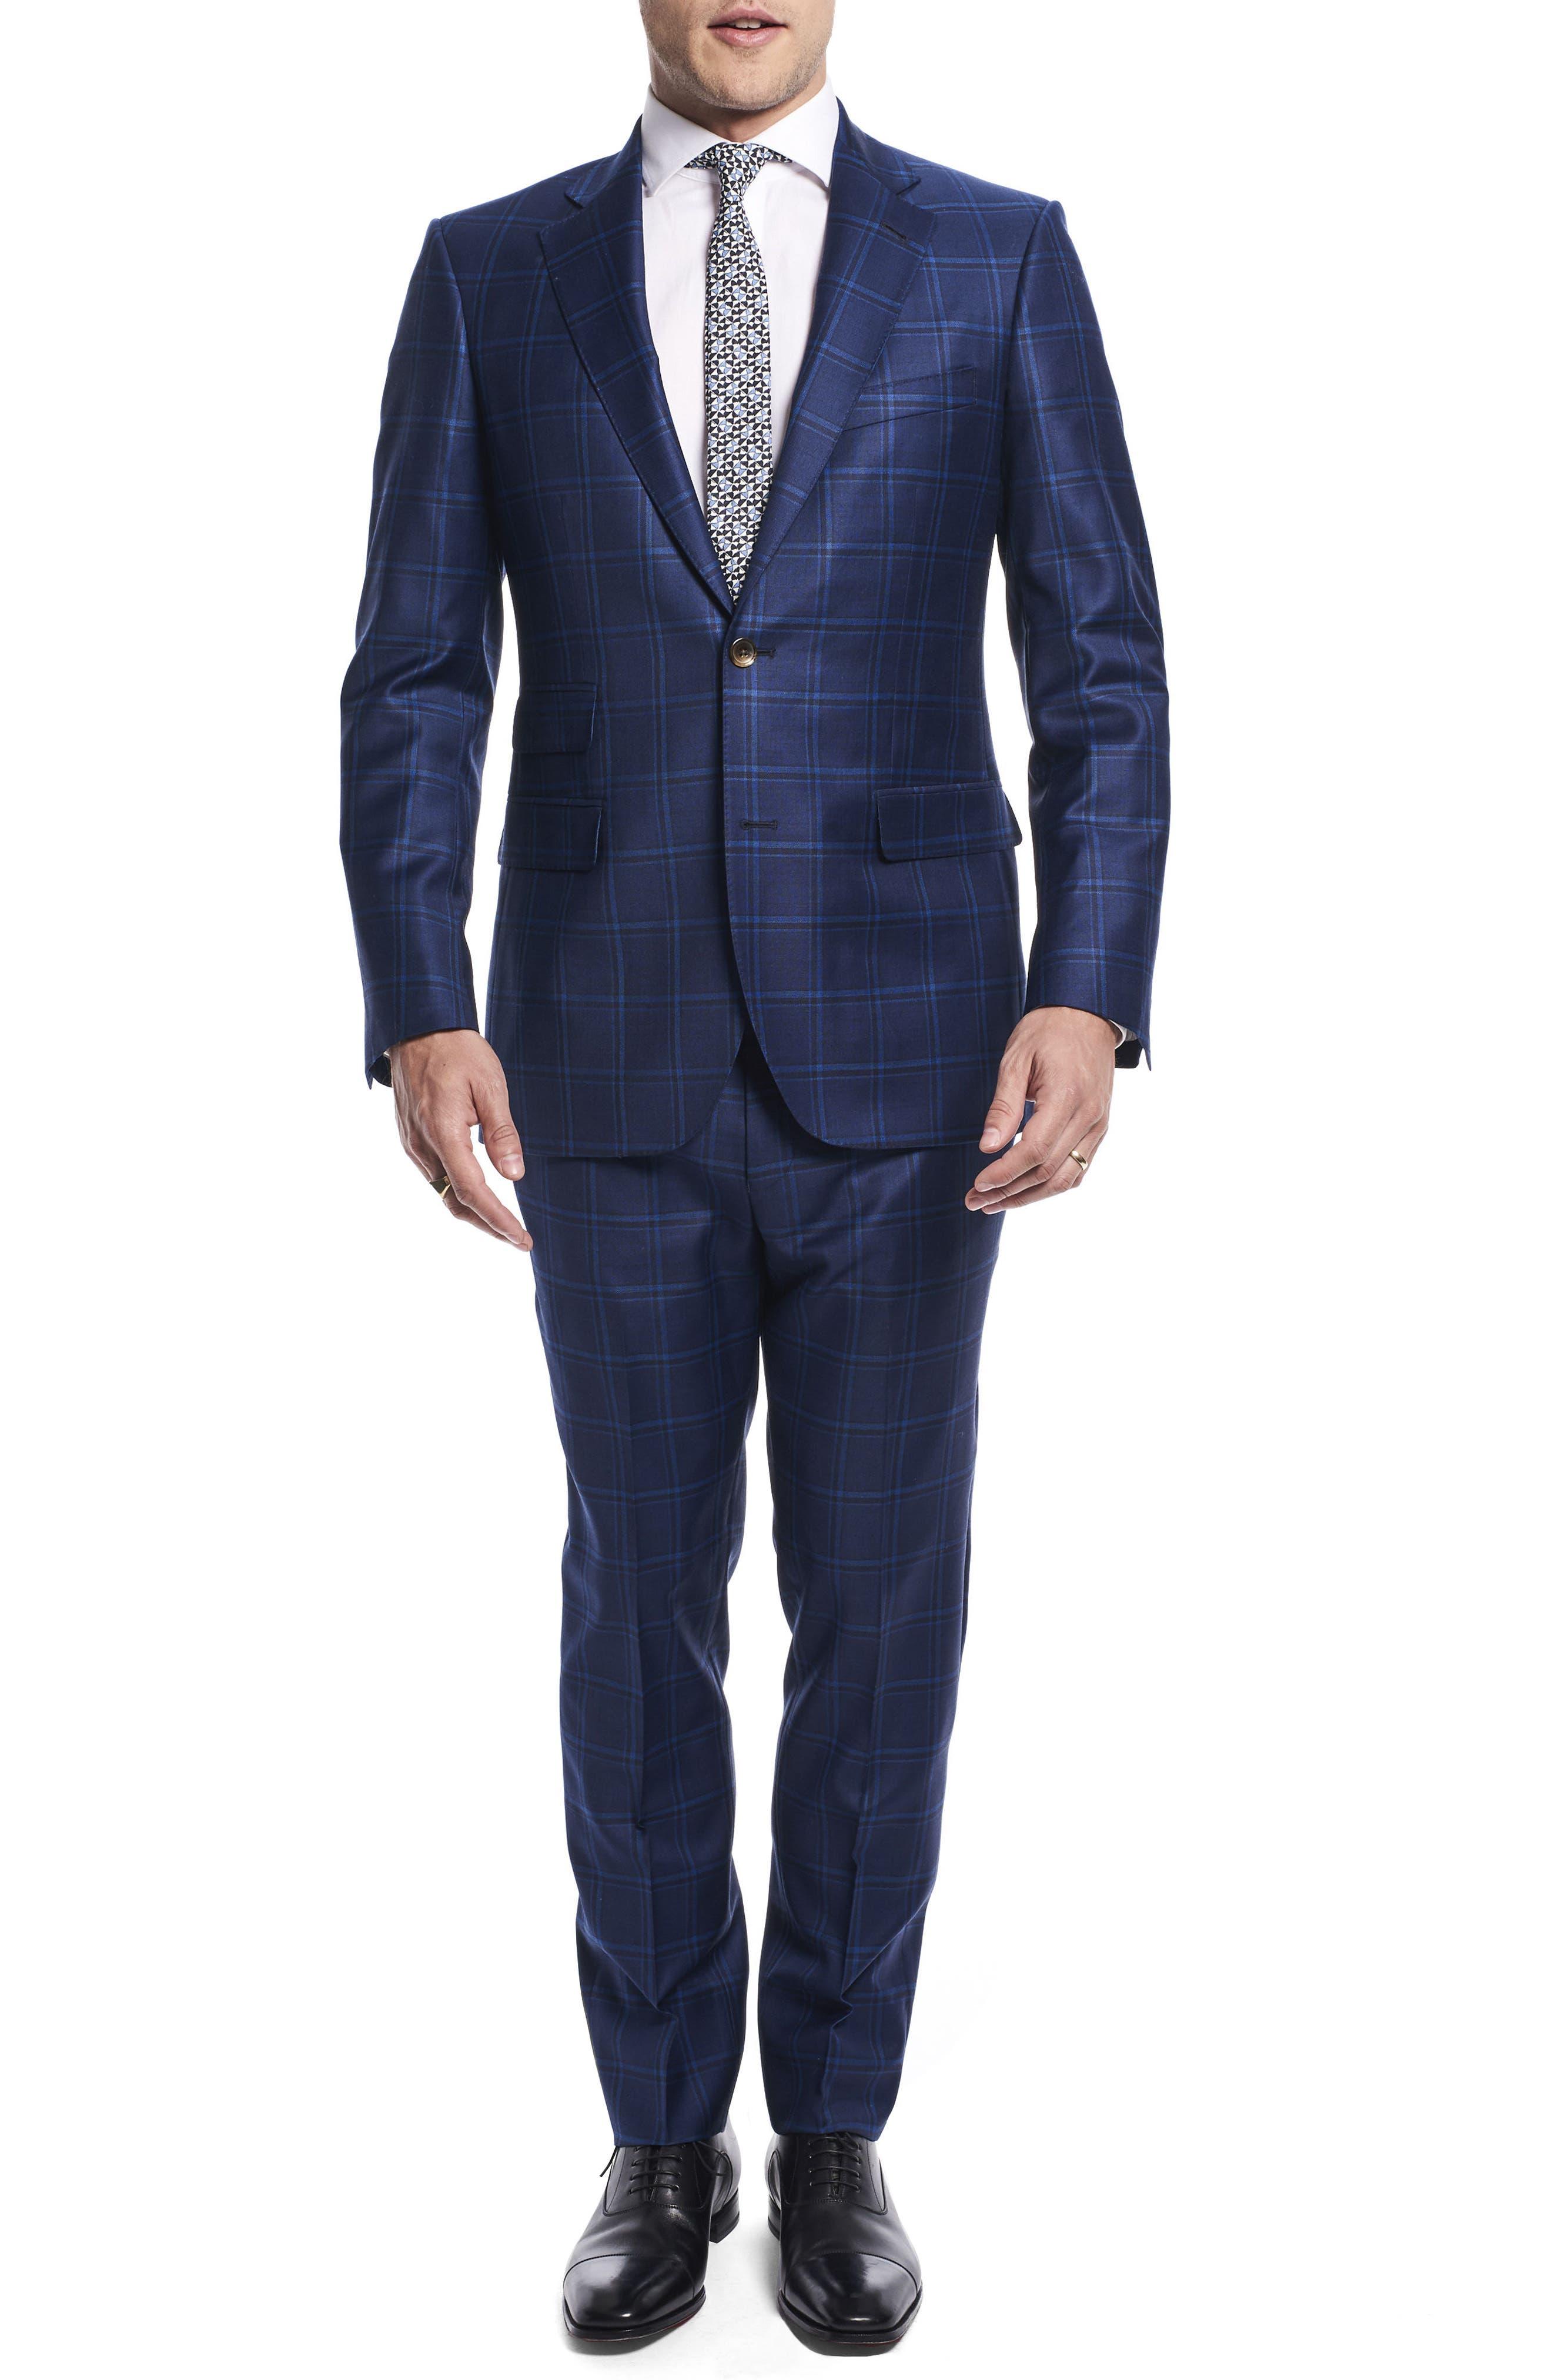 Main Image - Strong Suit by Ilaria Urbinati Kilgore Slim Fit Plaid Wool Suit (Nordstrom Exclusive)